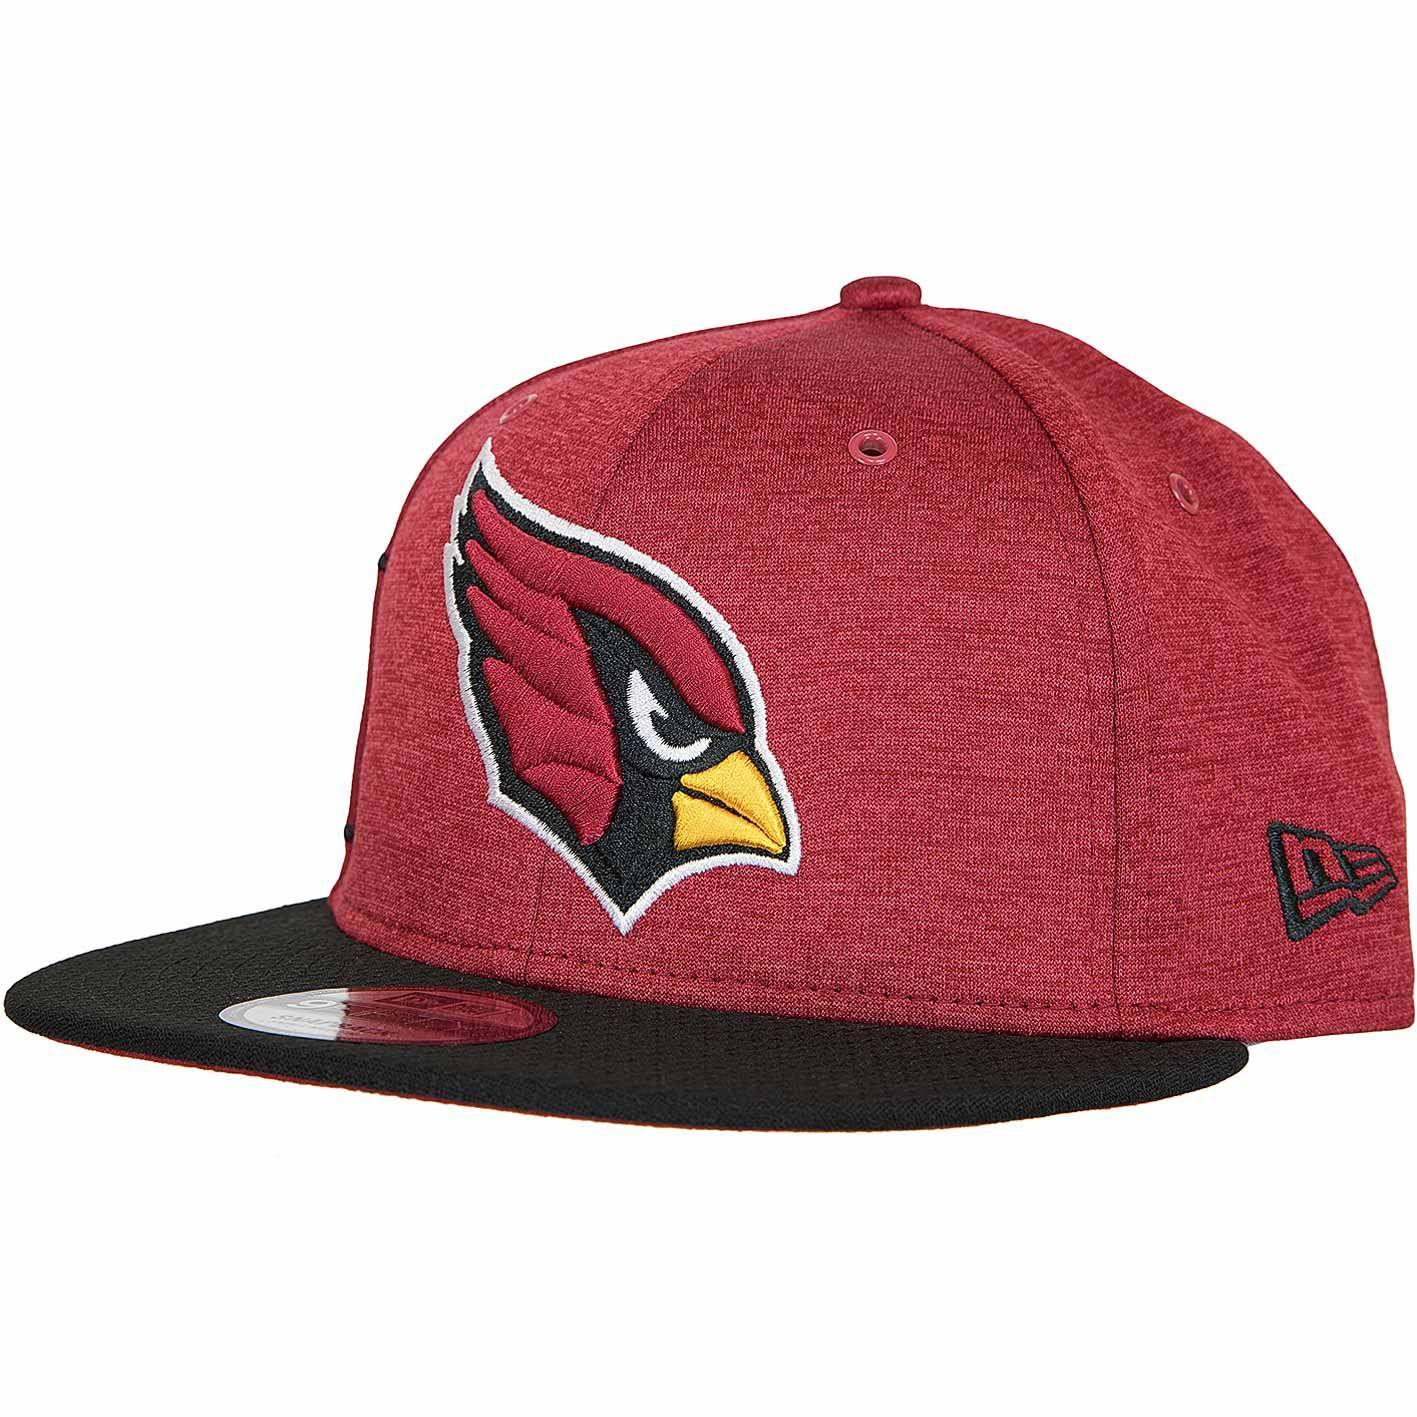 New Era 9fifty Snapback Cap Onfield Home Arizona Cardinals Rot Schwarz Hier Bestellen Arizona Cardinals Snapback Cap Snapback